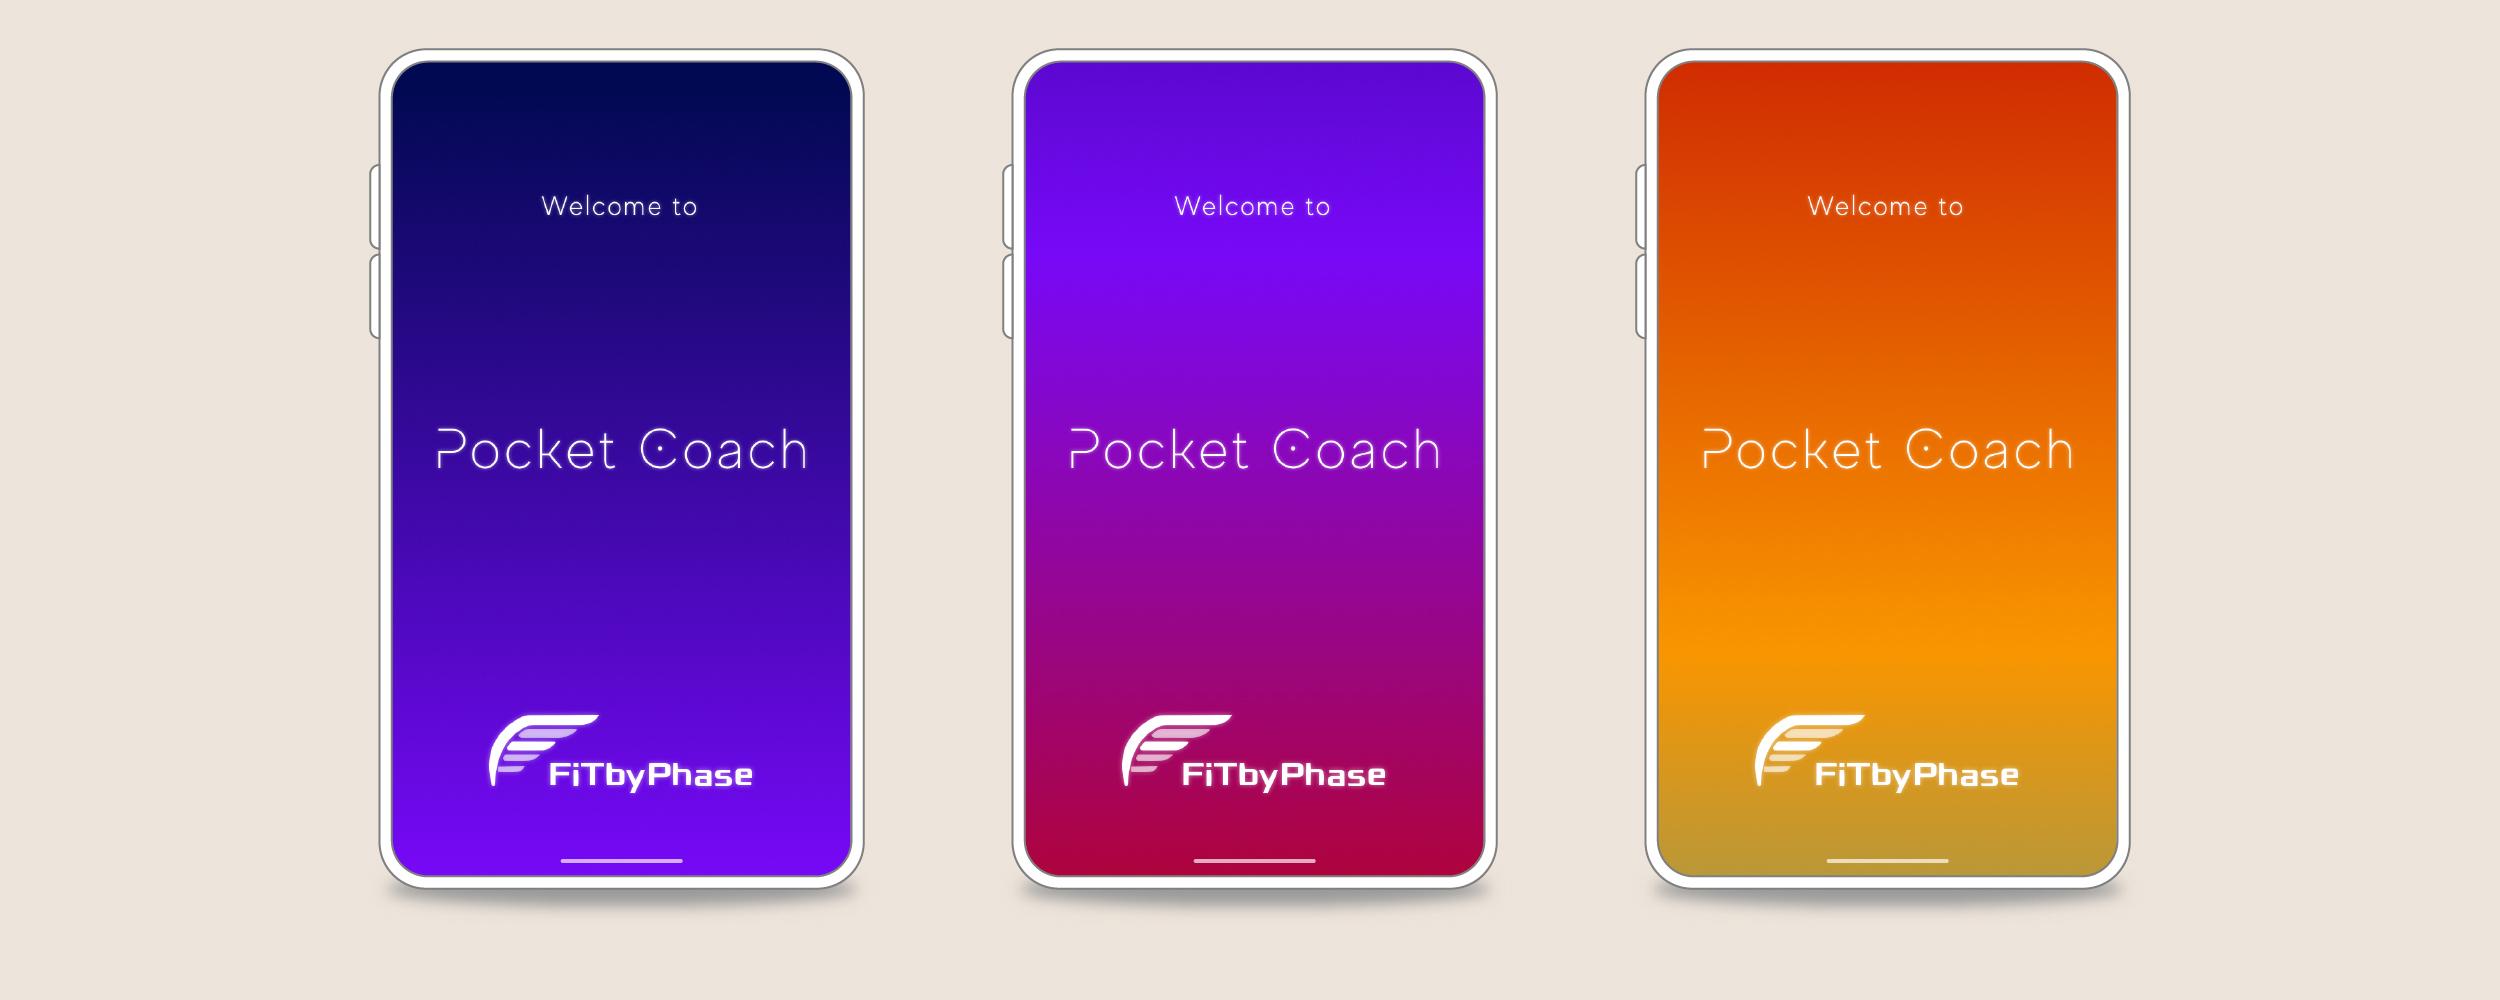 Pocket Coach Fitness App